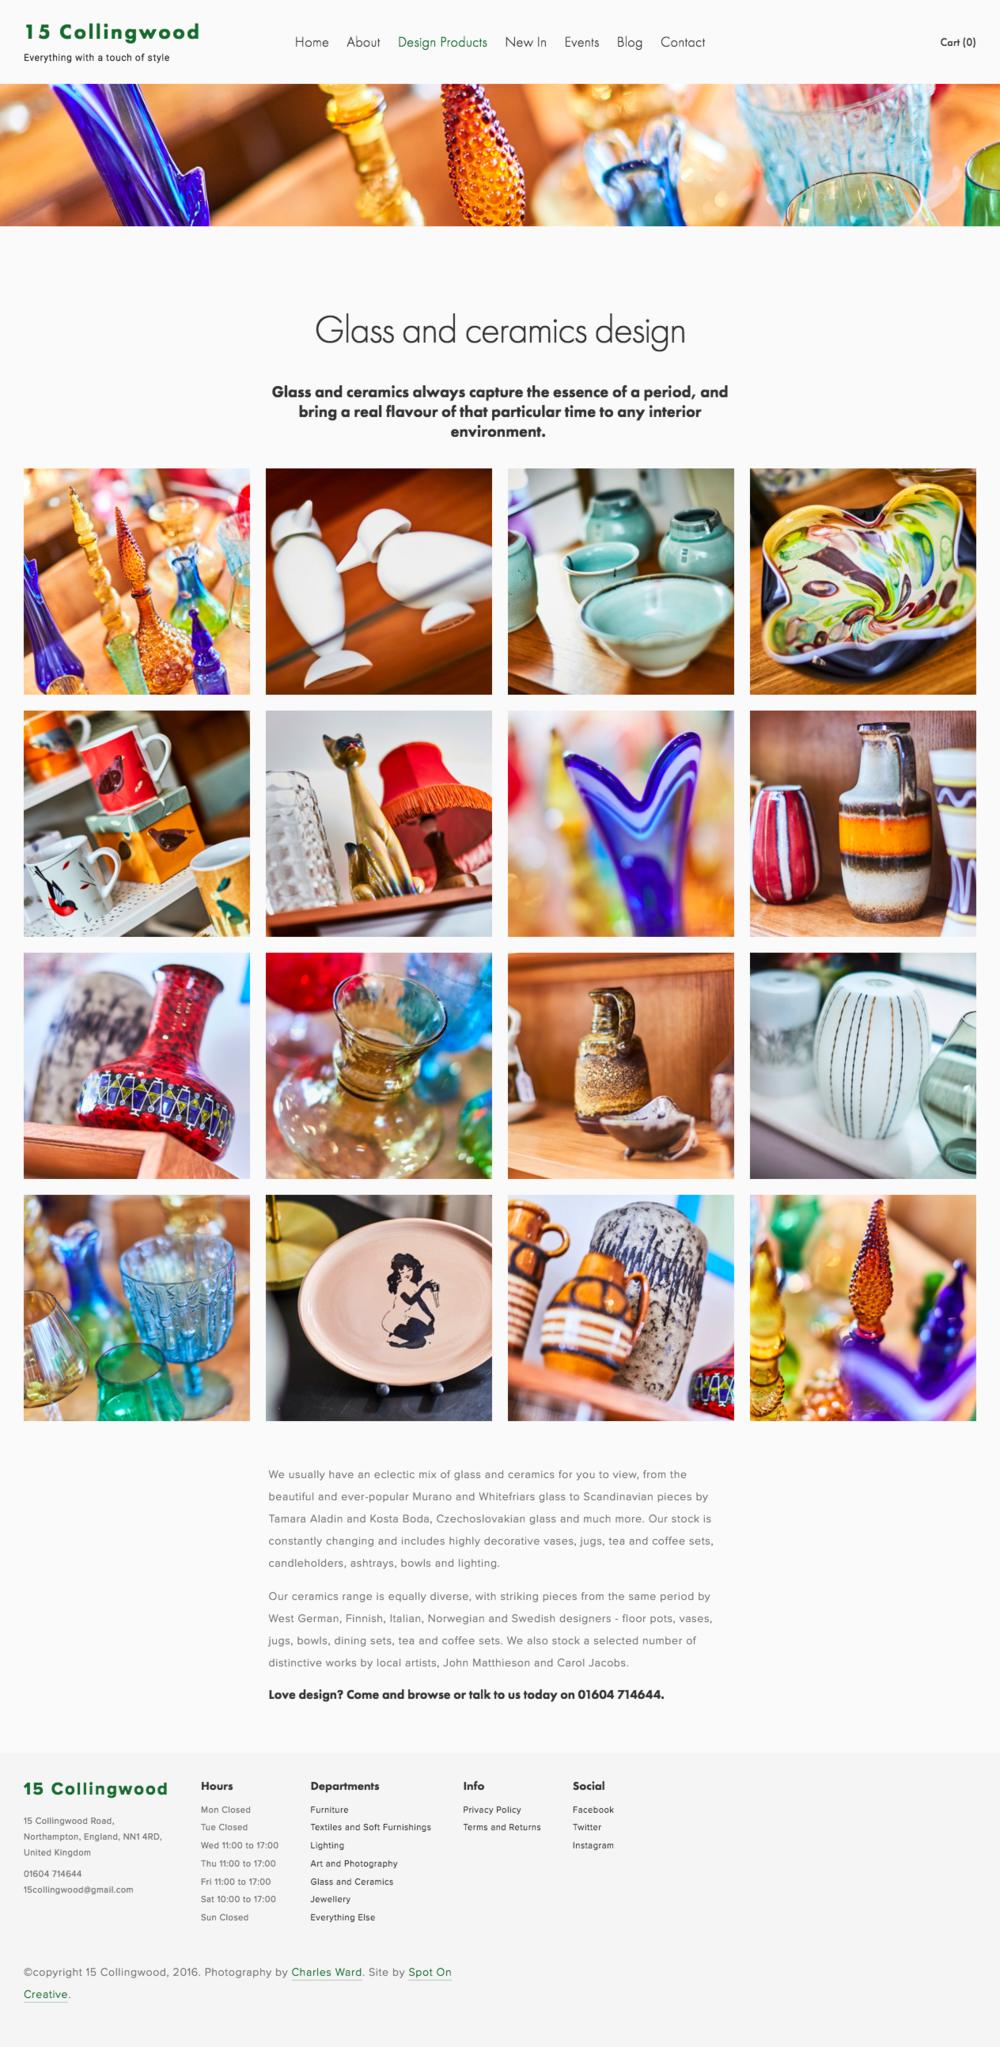 15 Collingwood-design-glass-and-ceramics.png